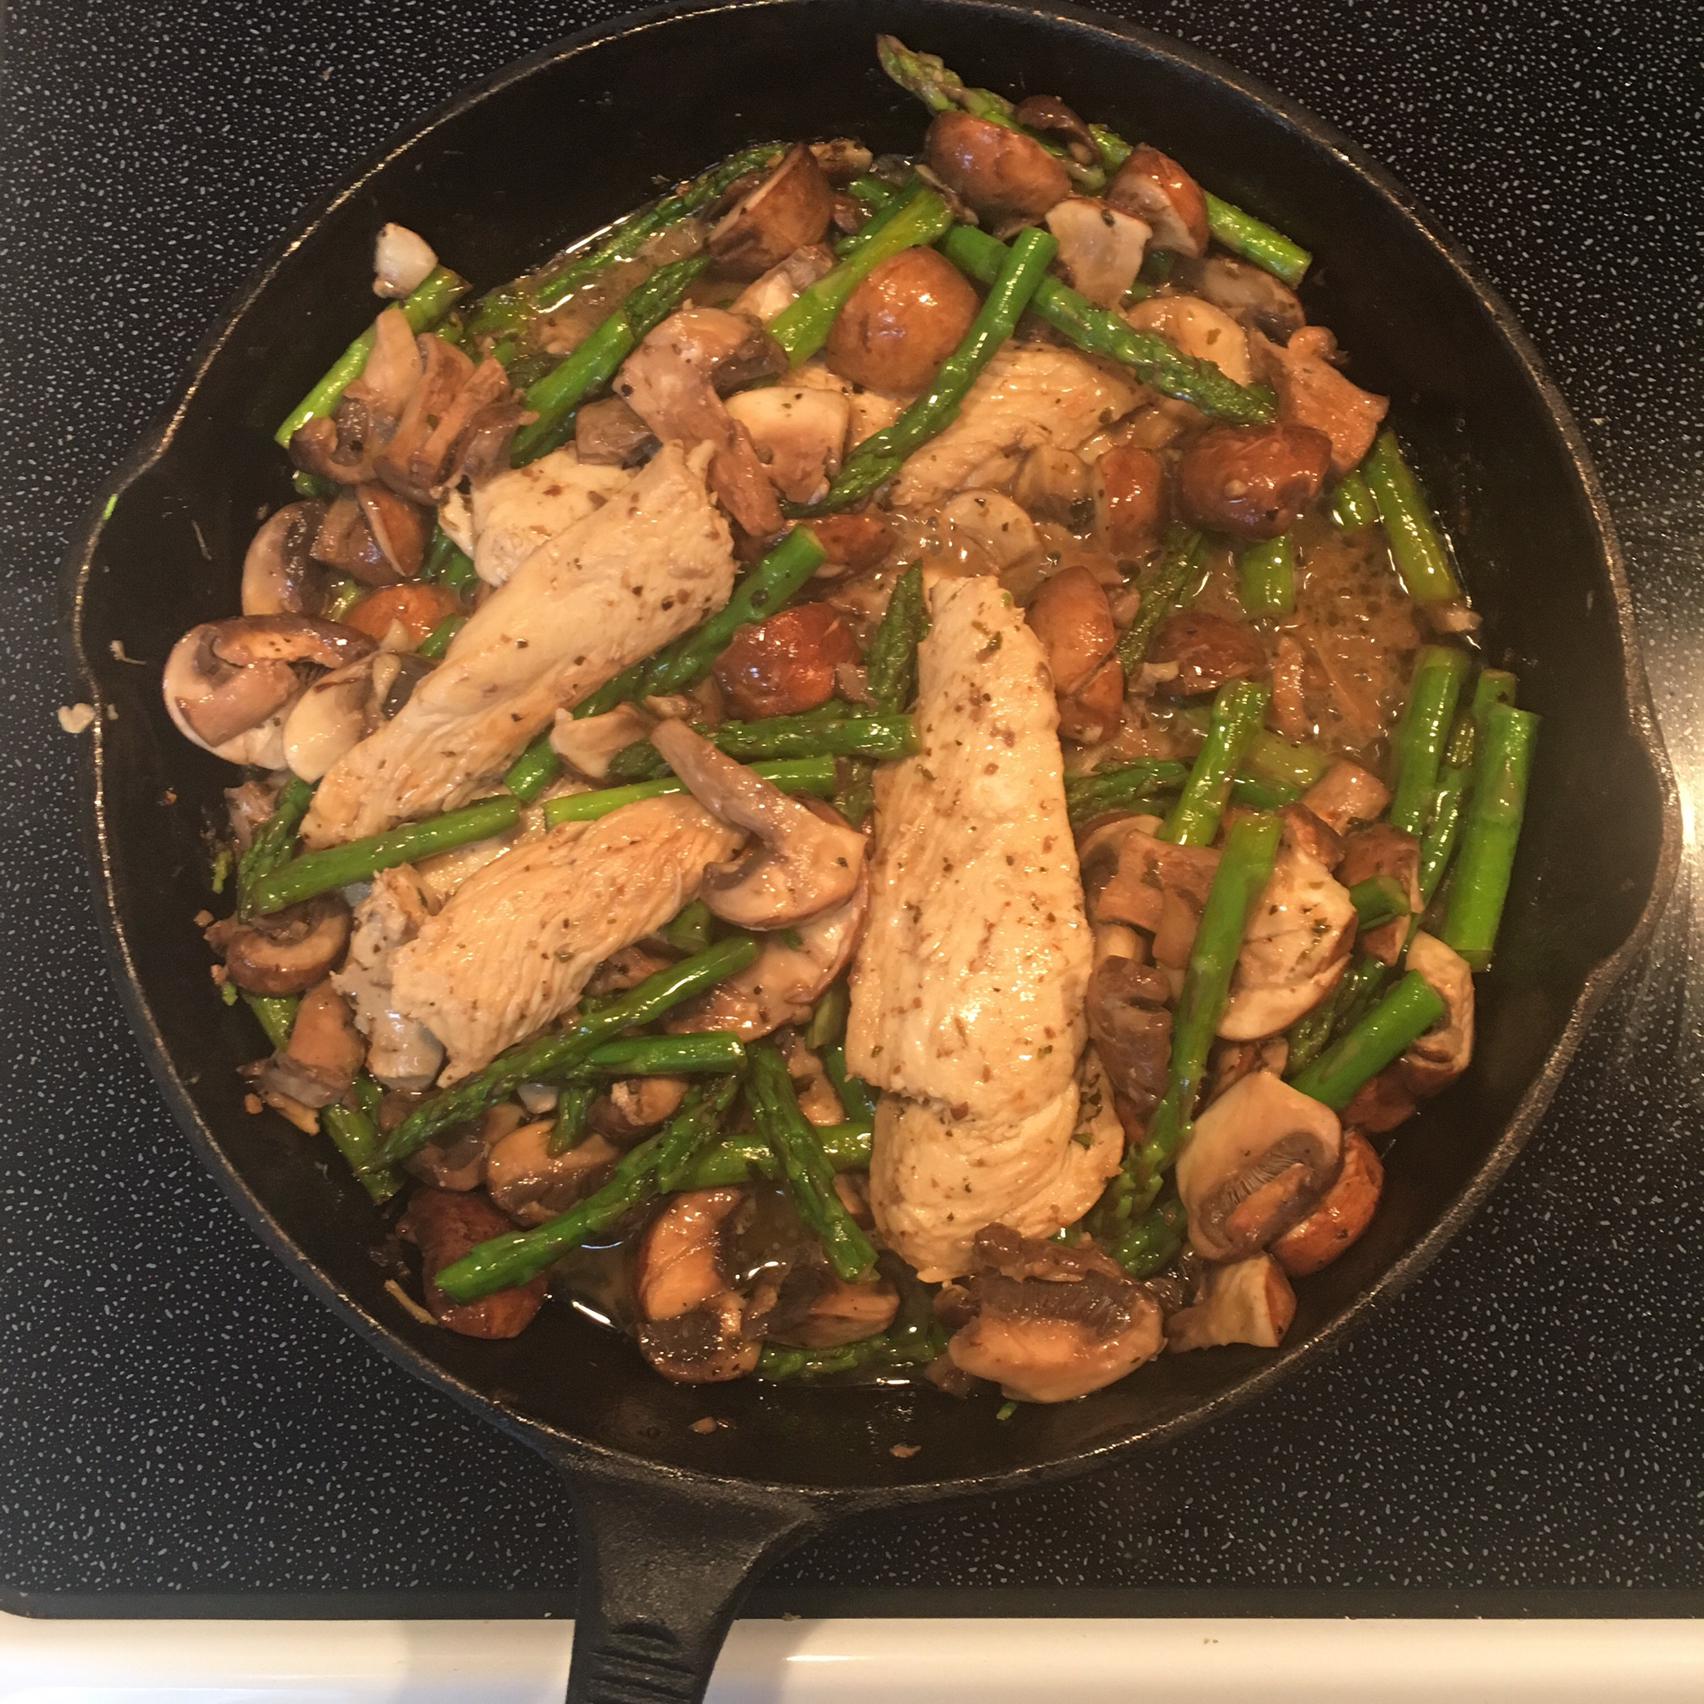 Chicken, Asparagus, and Mushroom Skillet Andie Sweets